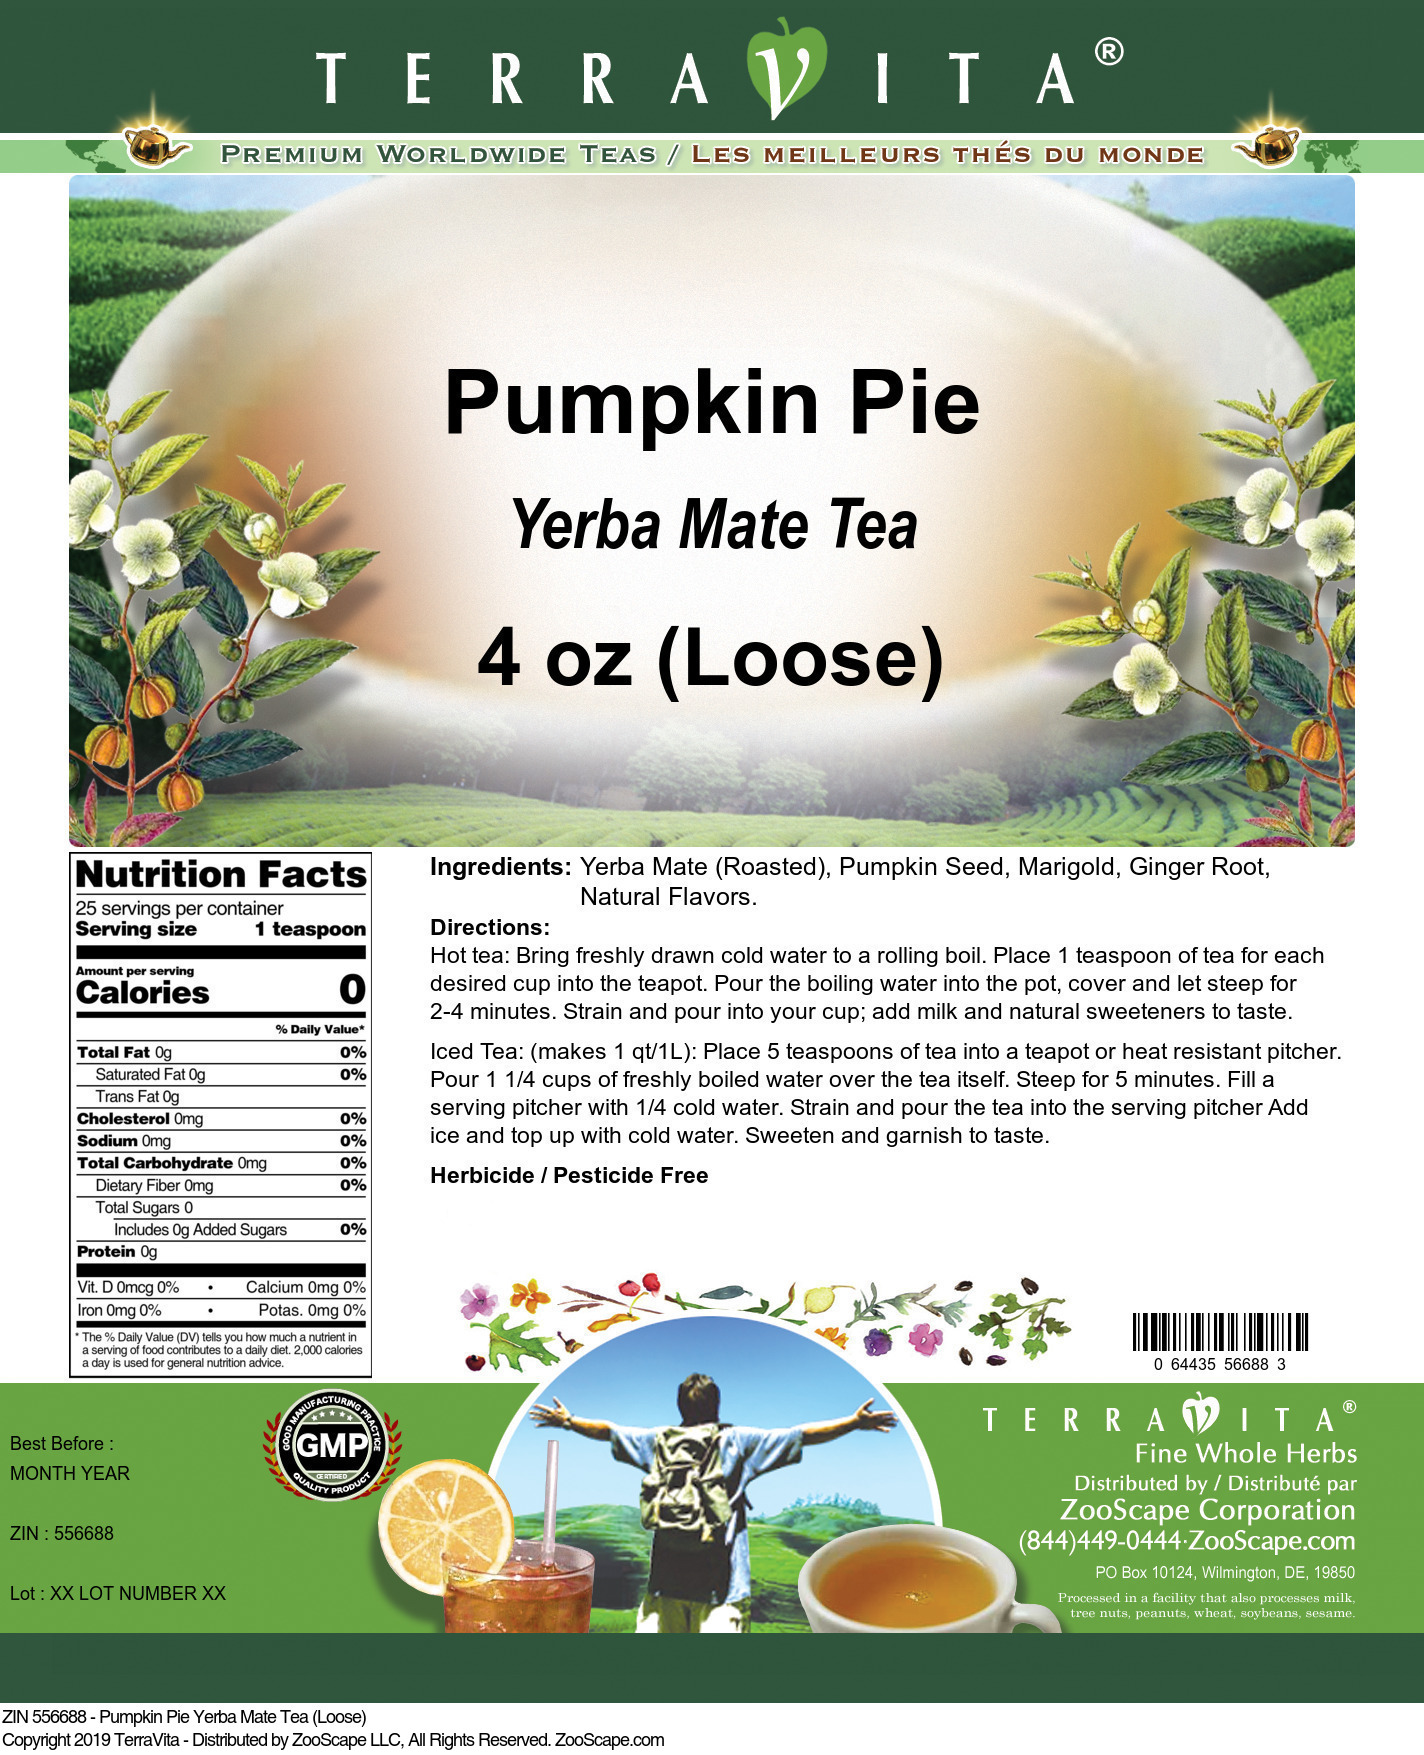 Pumpkin Pie Yerba Mate